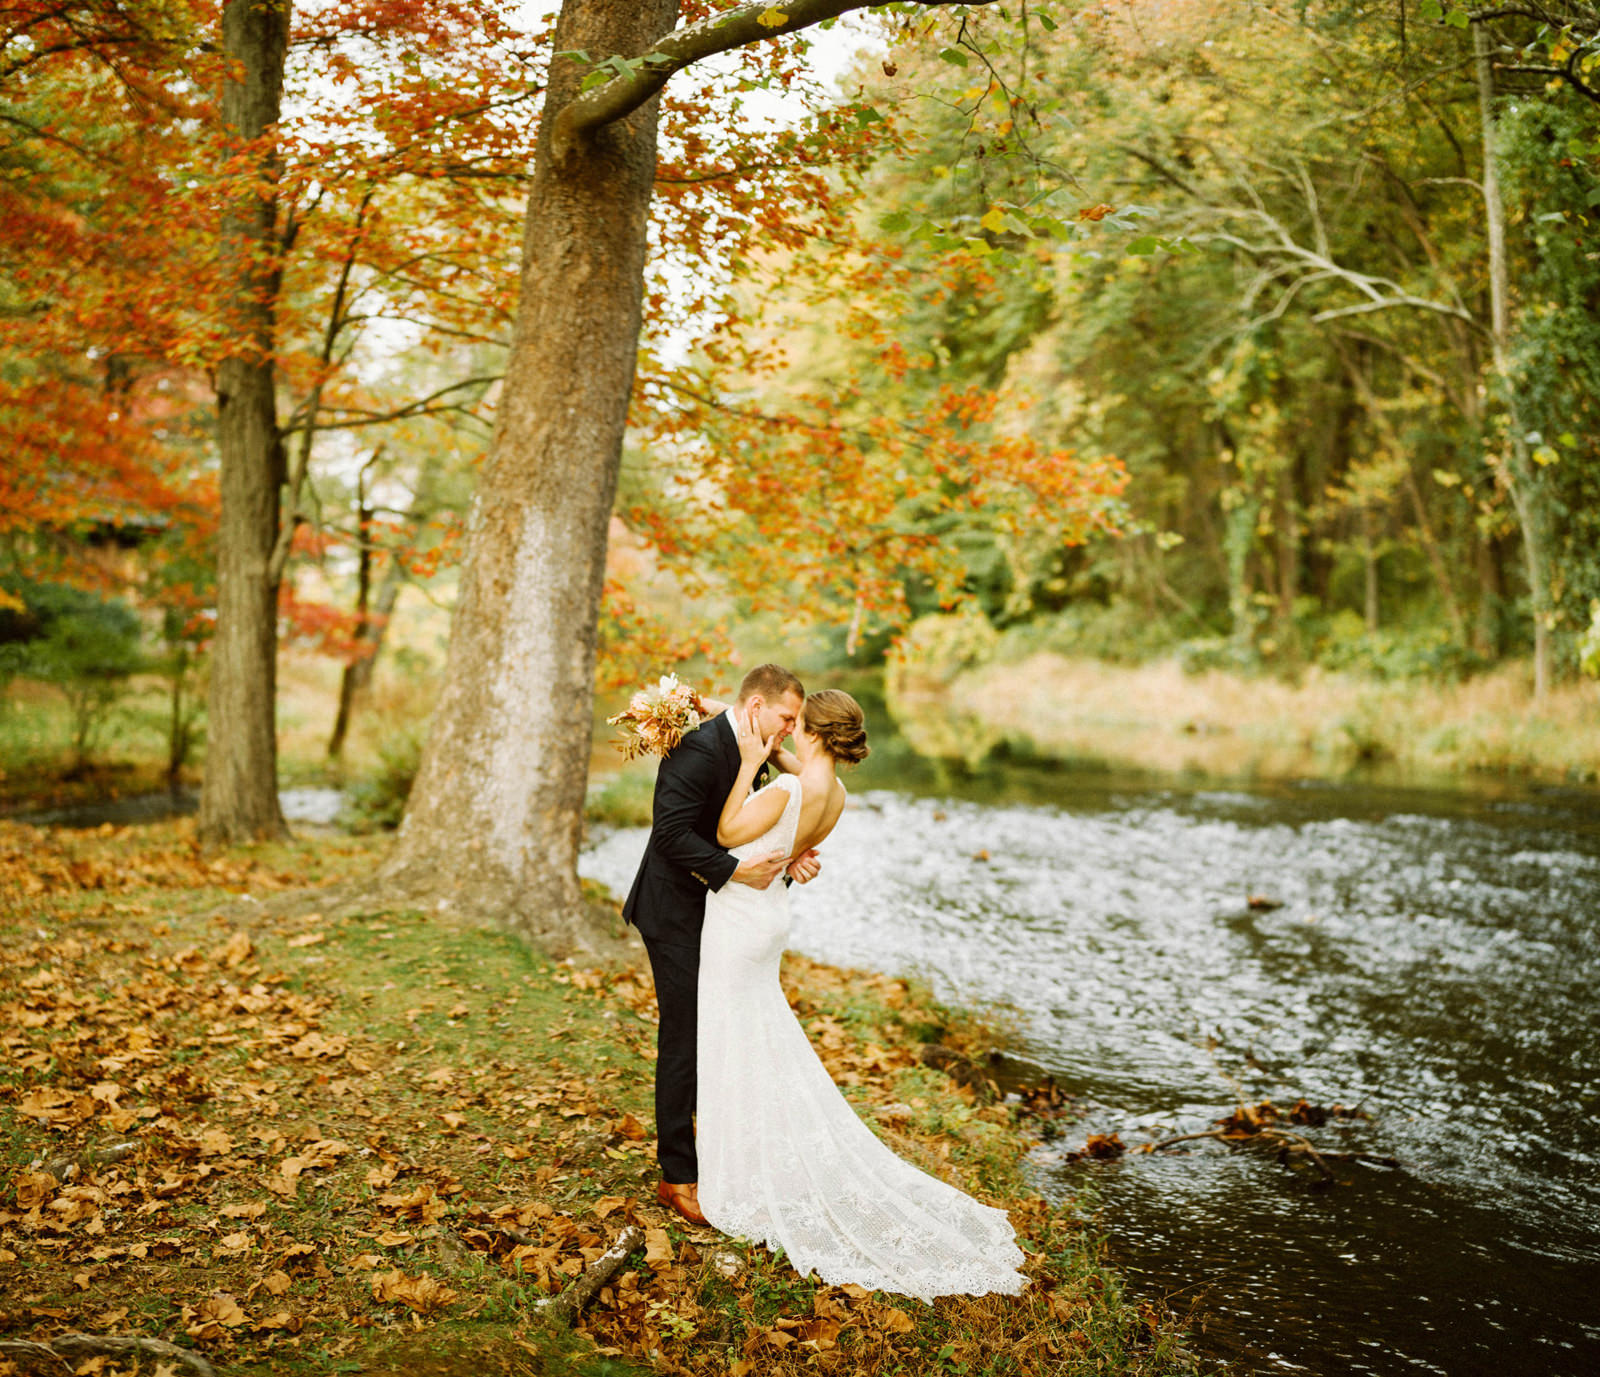 bridgeport-wedding-113 BRIDGEPORT, CONNECTICUT BACKYARD WEDDING